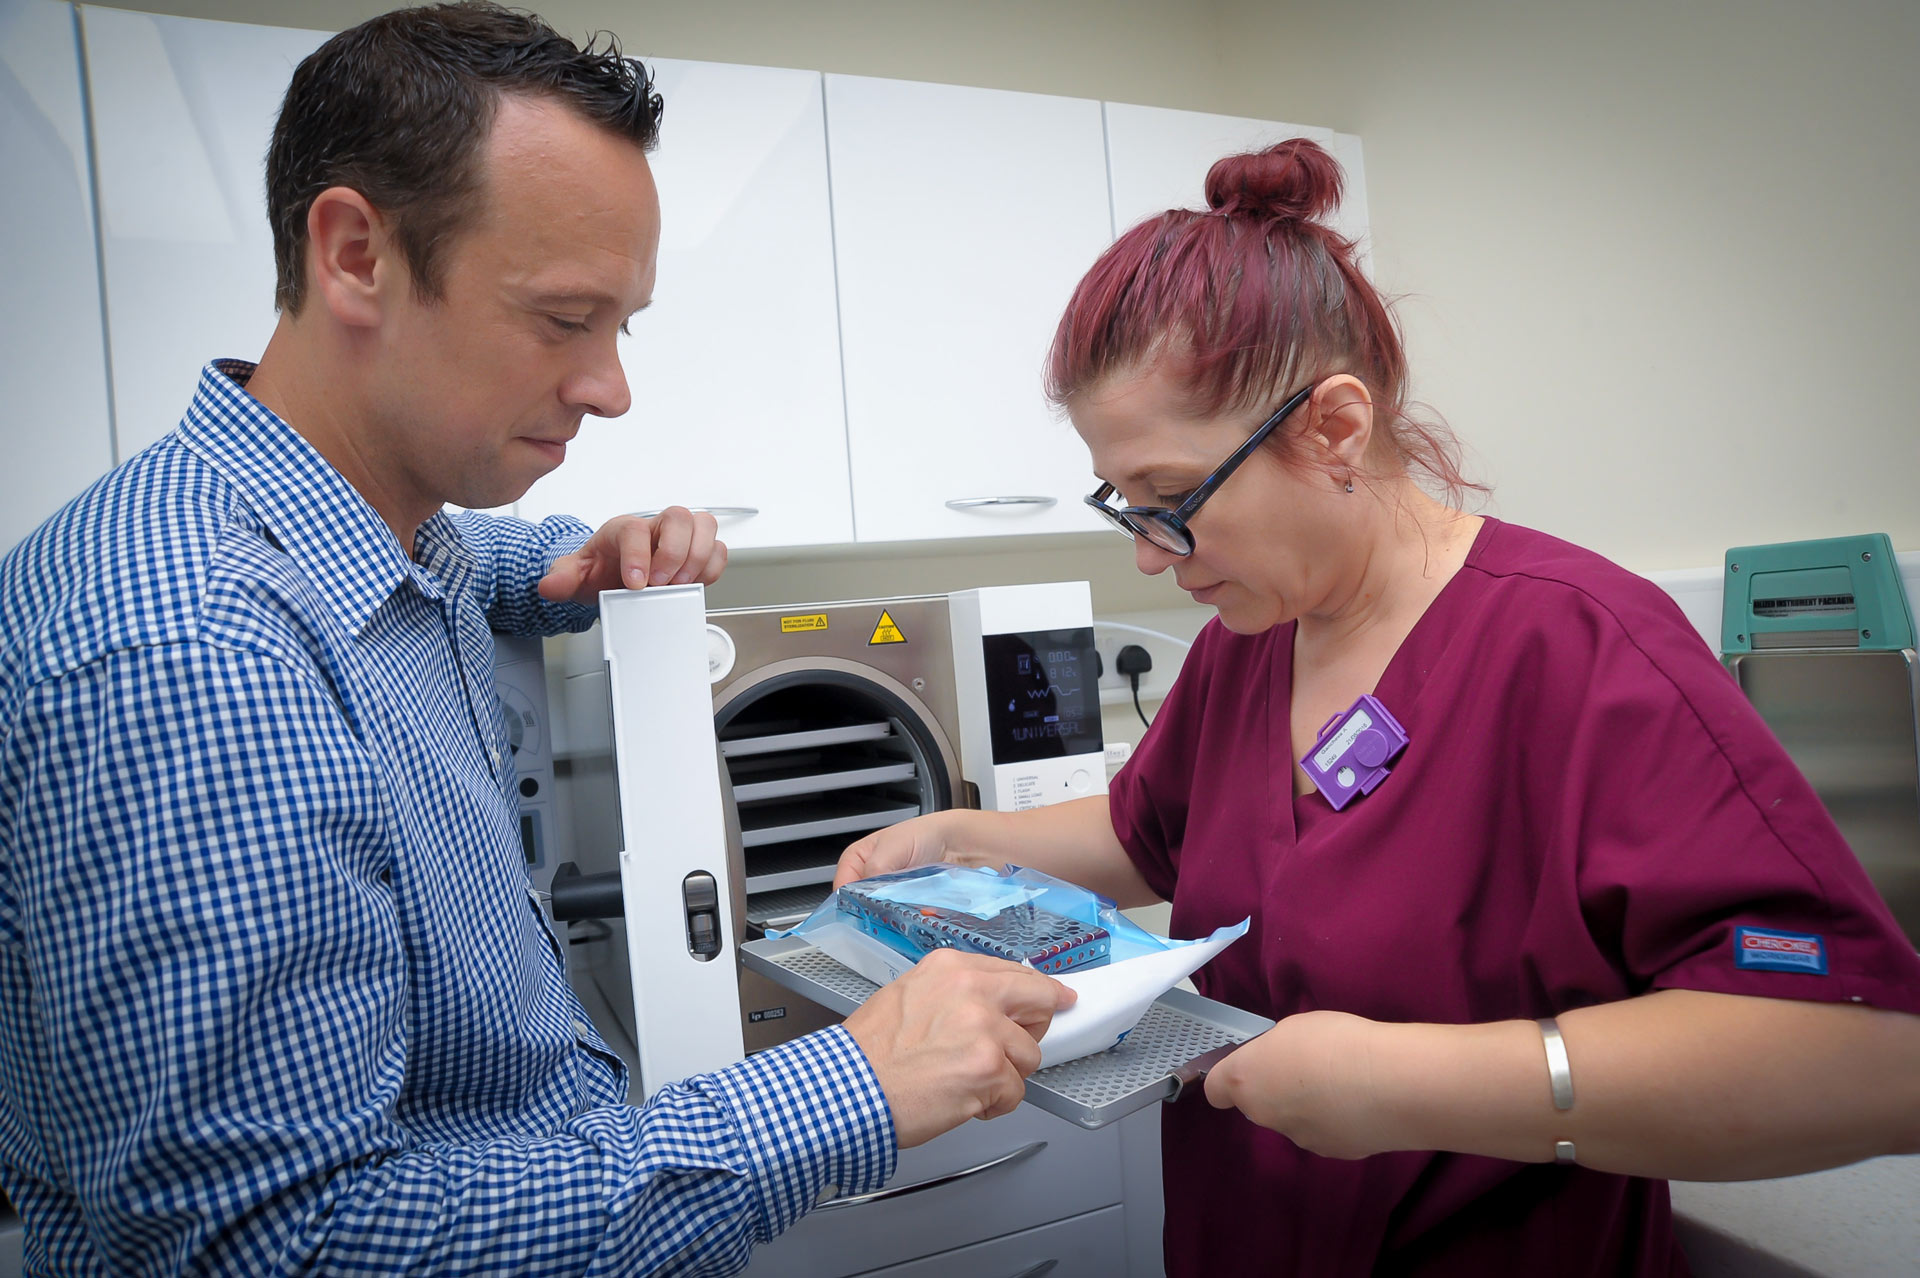 Dirty to clean: best practice in  handpiece decontamination